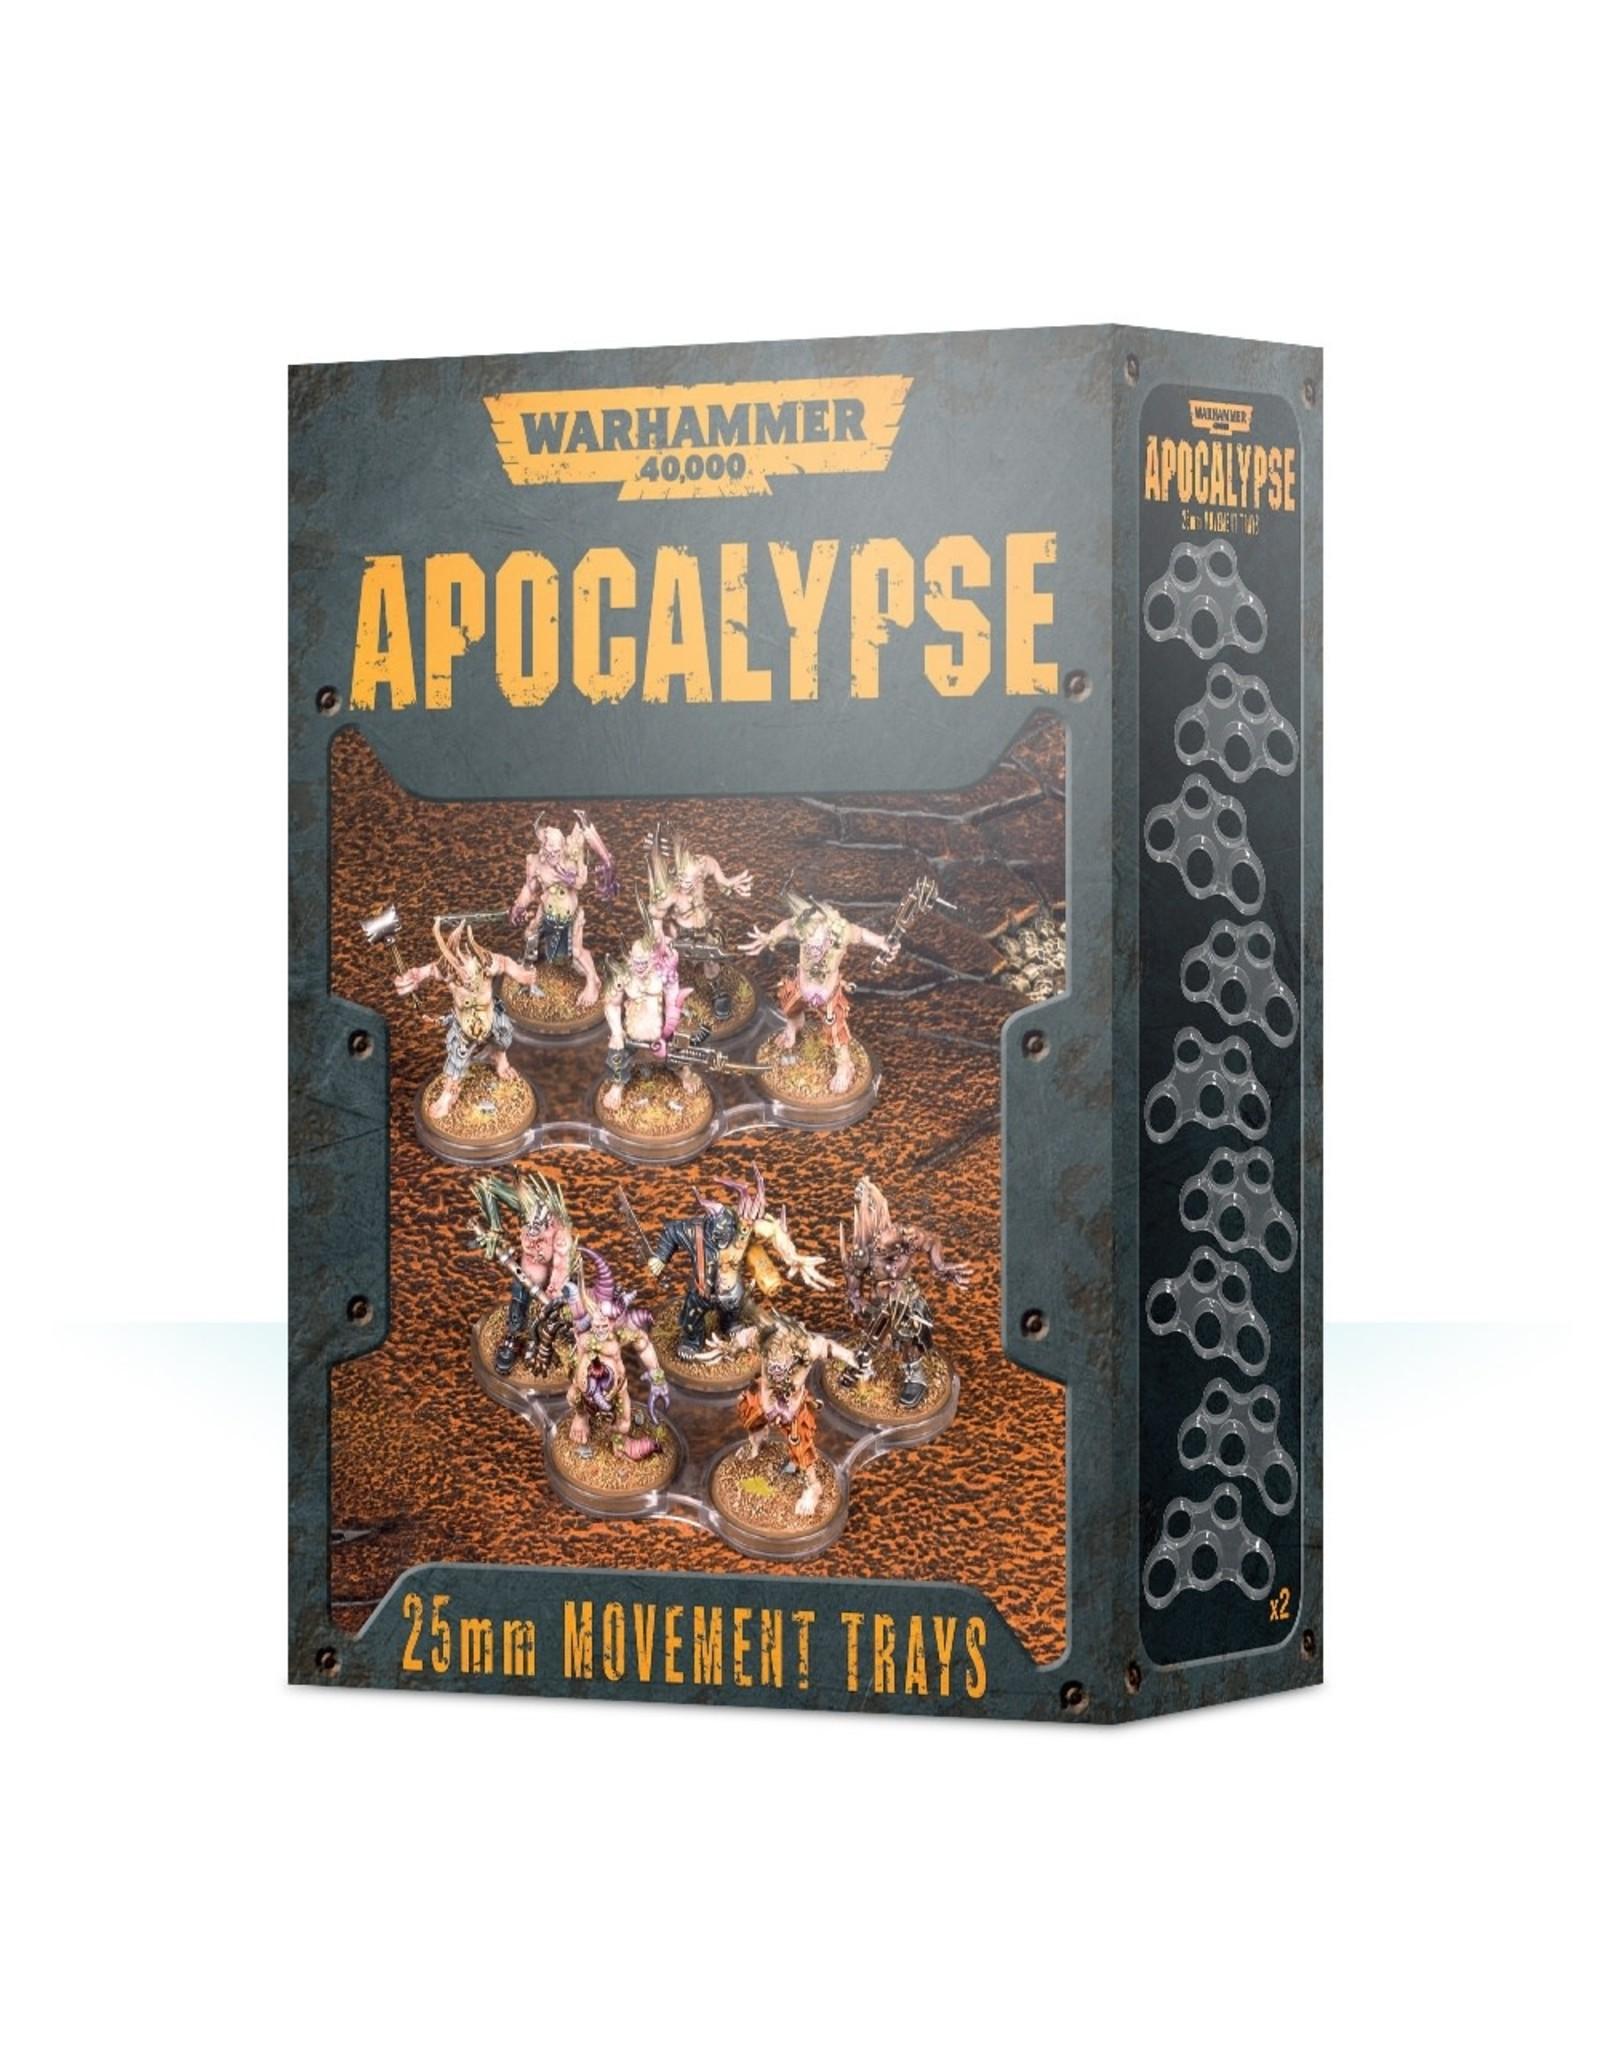 Games Workshop Apocalypse Movement Trays: 25mm